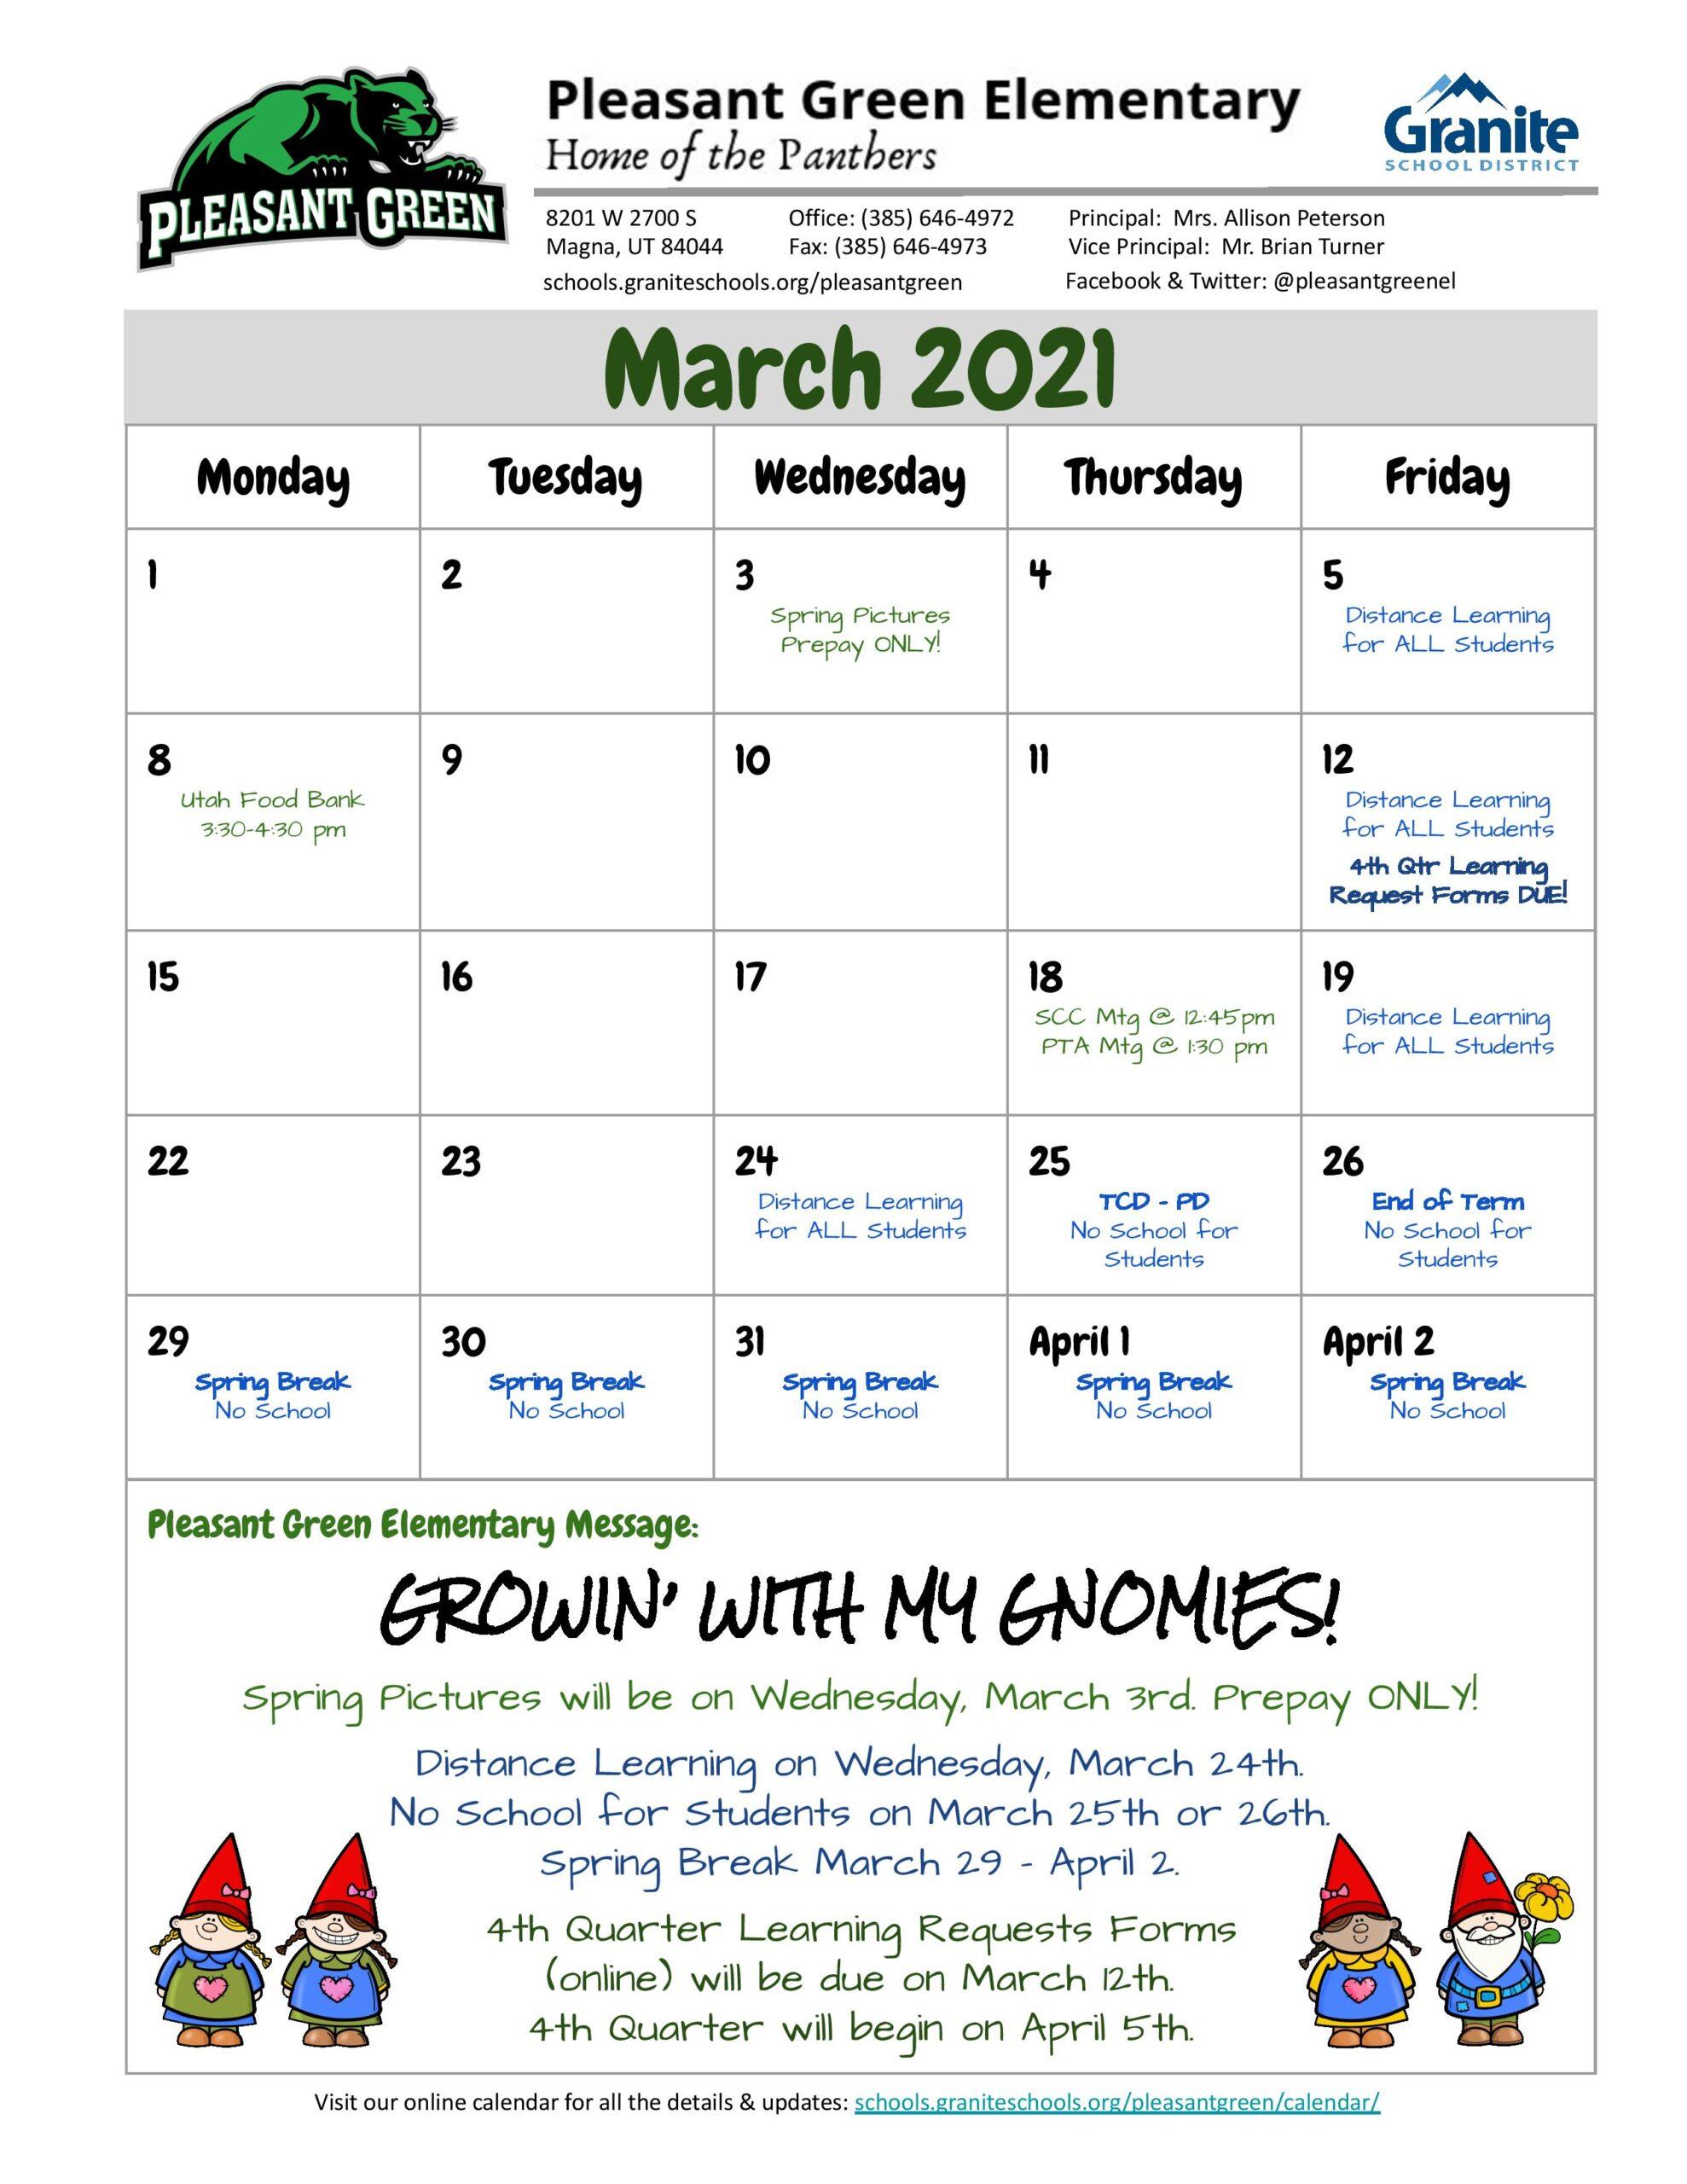 Ut Spring 2022 Calendar.March 2021 Newsletter Calendar